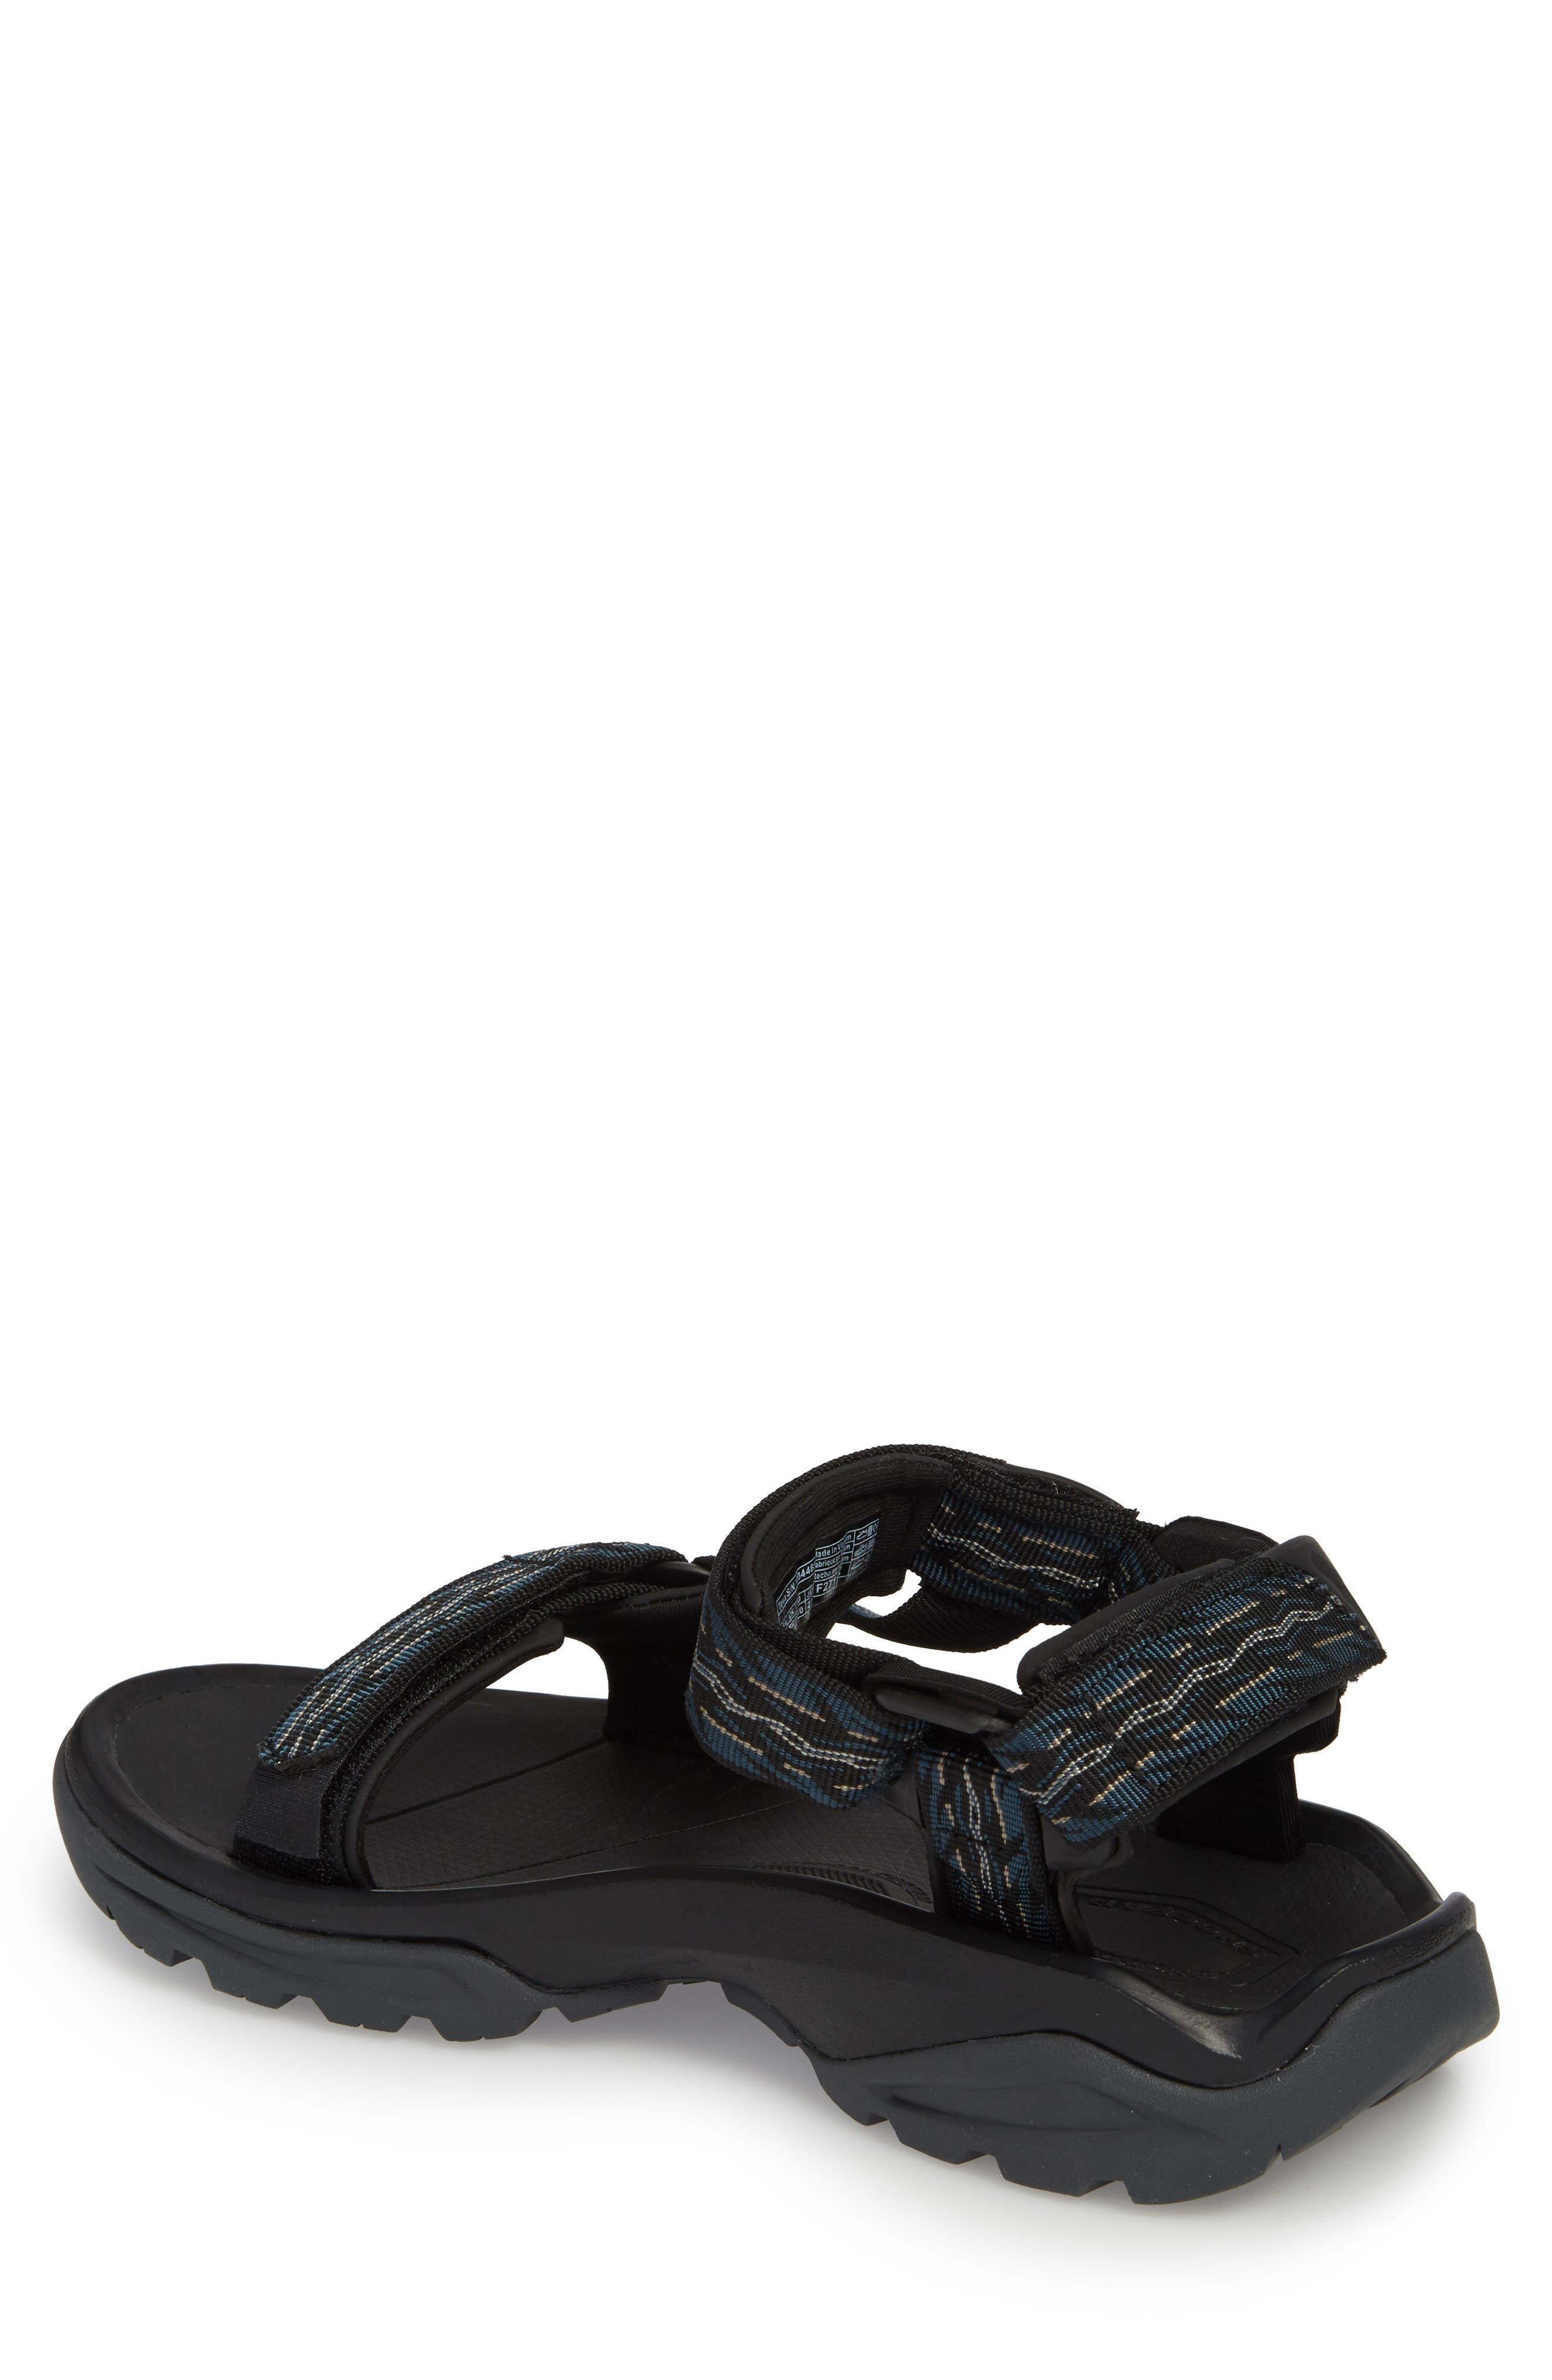 Terra Fi 4 Sport Sandal,                             Alternate thumbnail 2, color,                             Midnight Blue Nylon